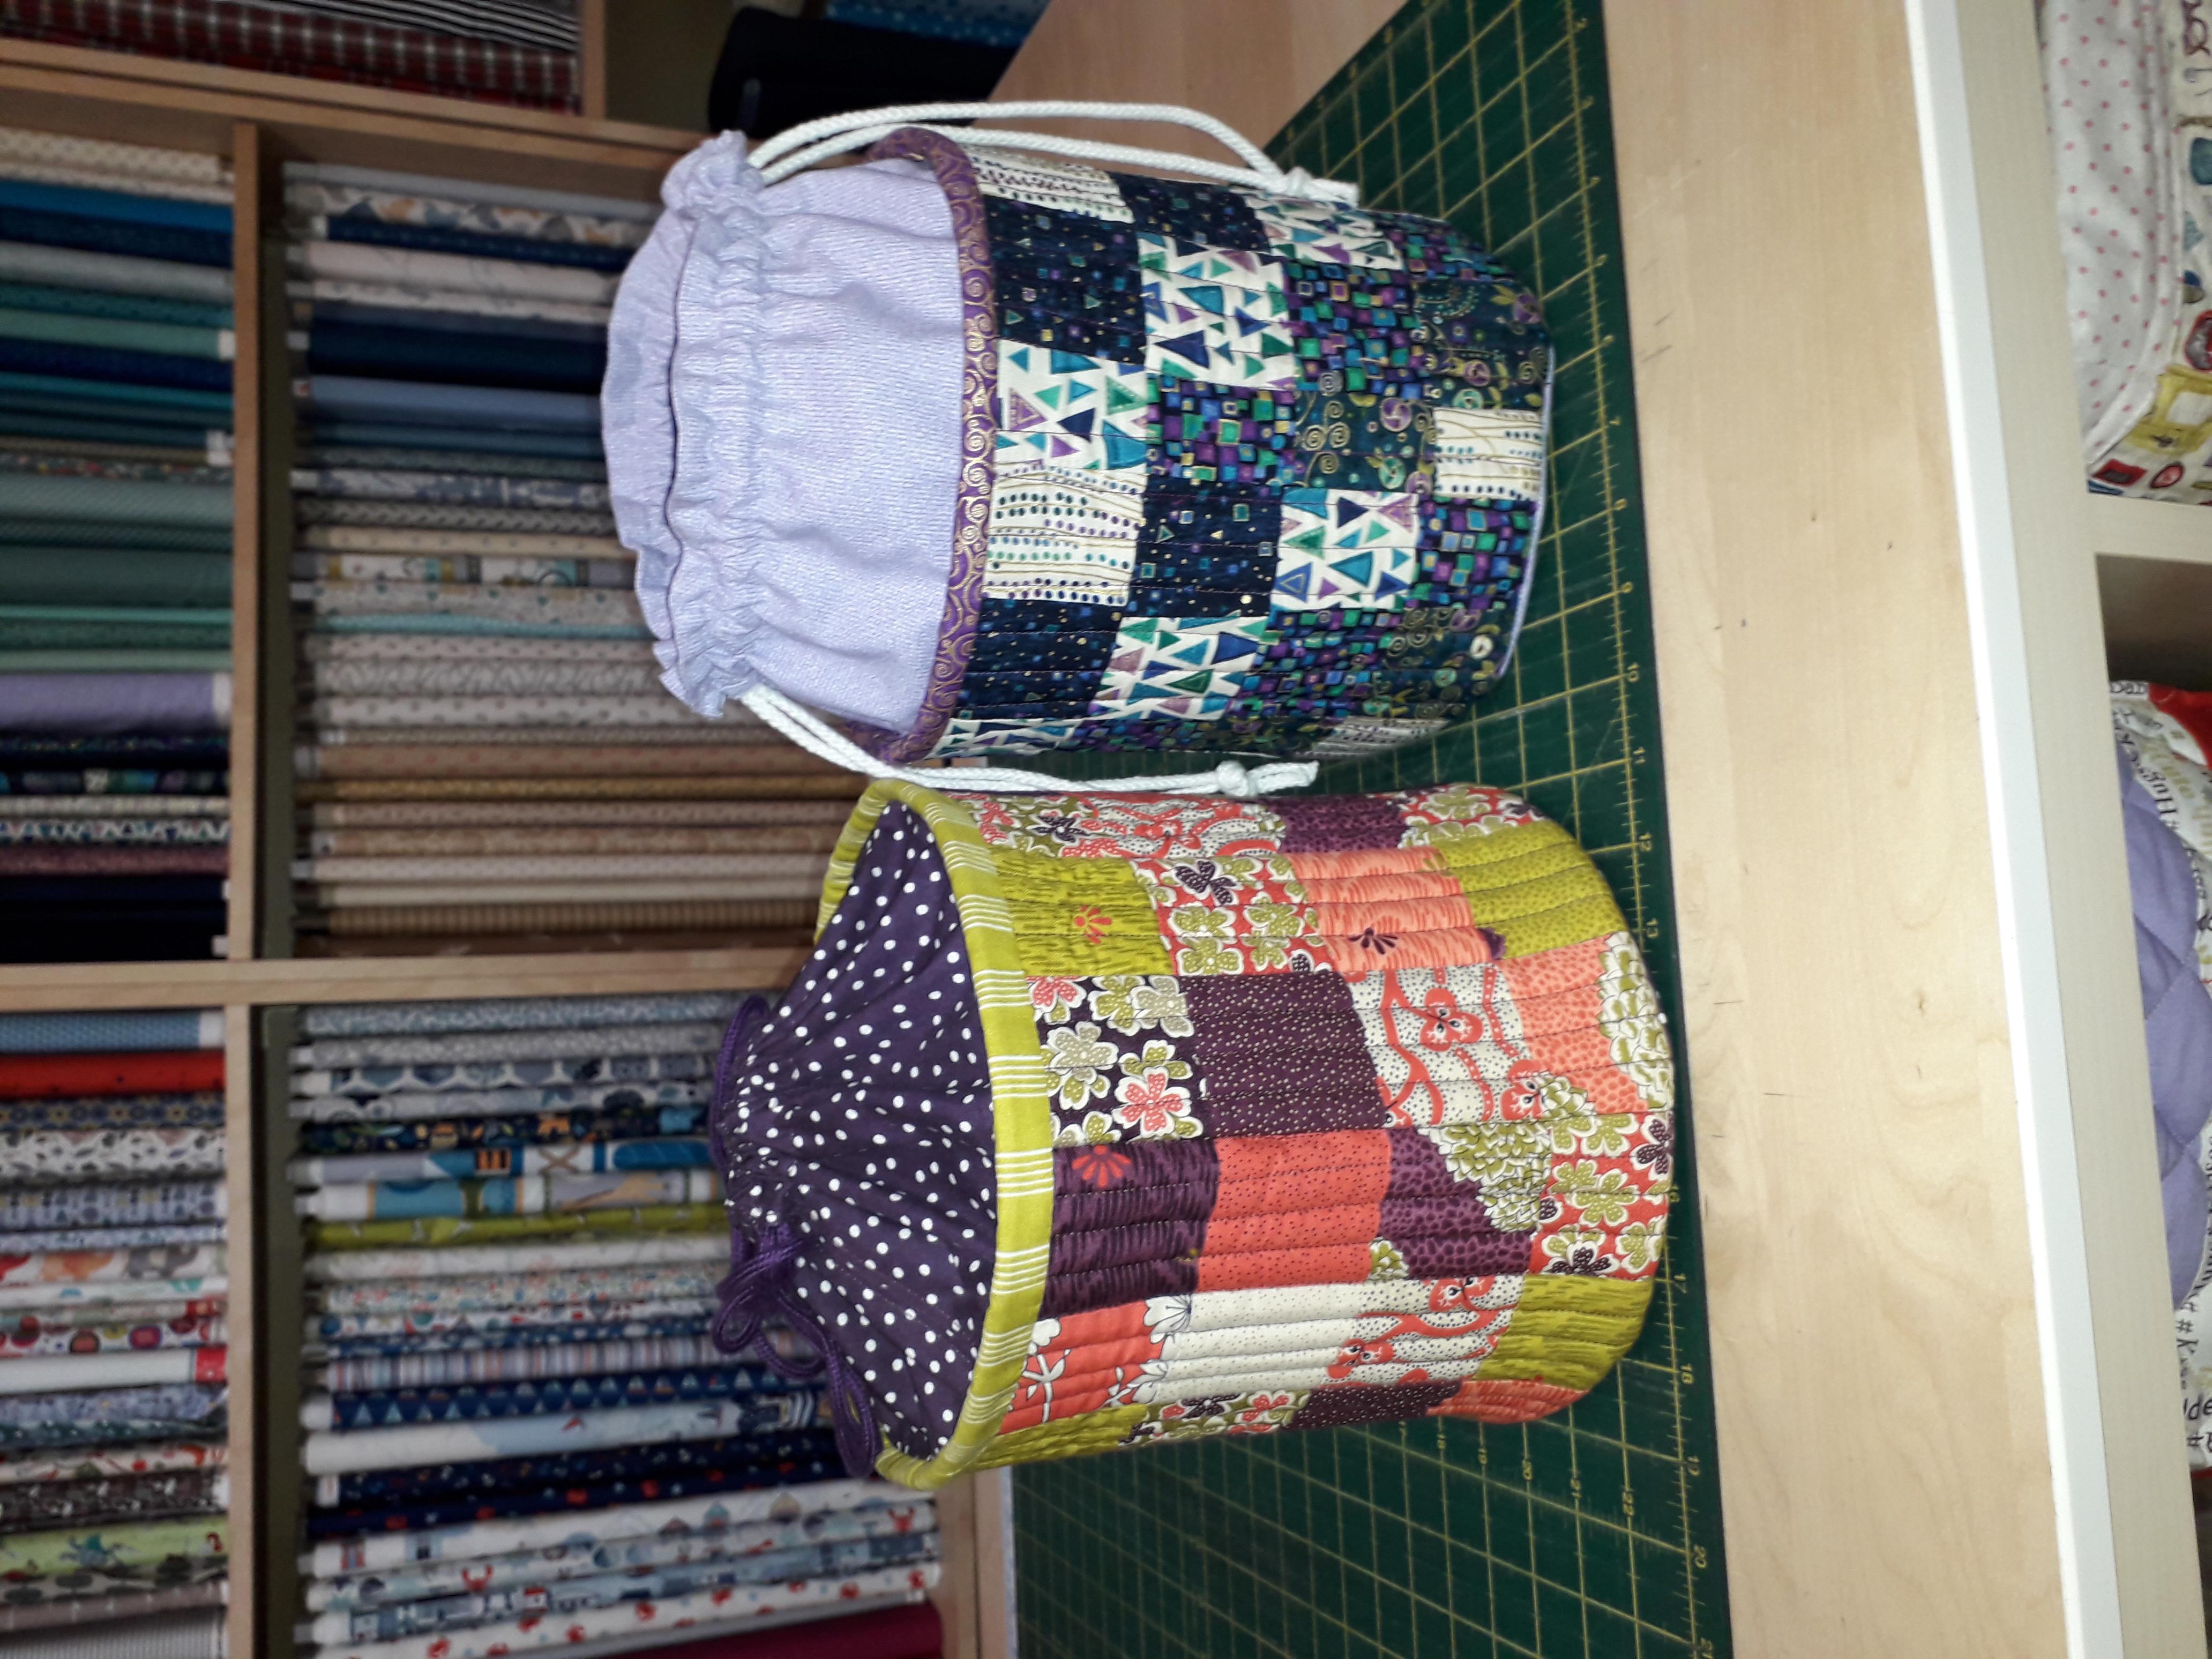 Fabric Tub with draw string closure